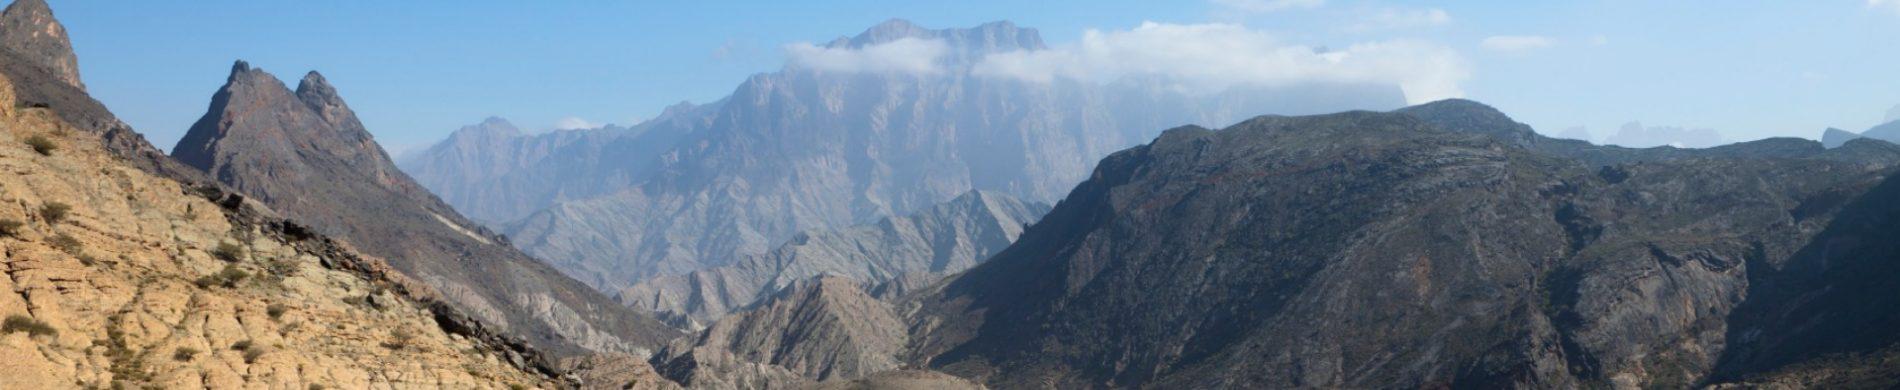 Oman - Escalade dans le Sultanat d'Oman - Les matins du monde